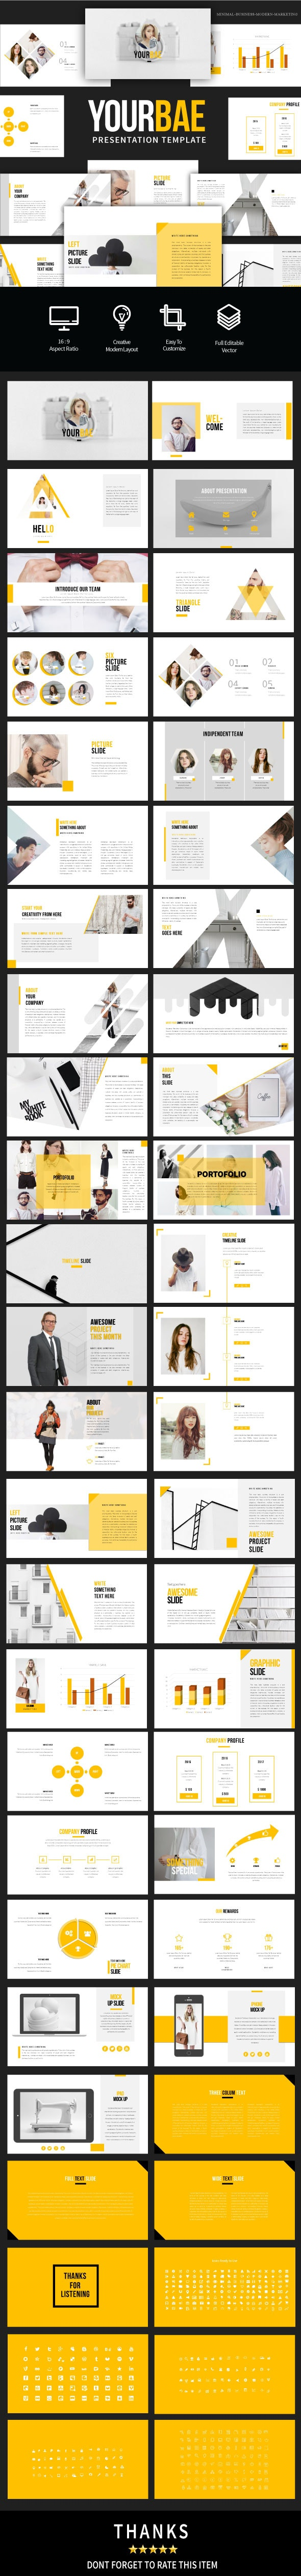 Yourbae Keynote Presentation Template - Business Keynote Templates